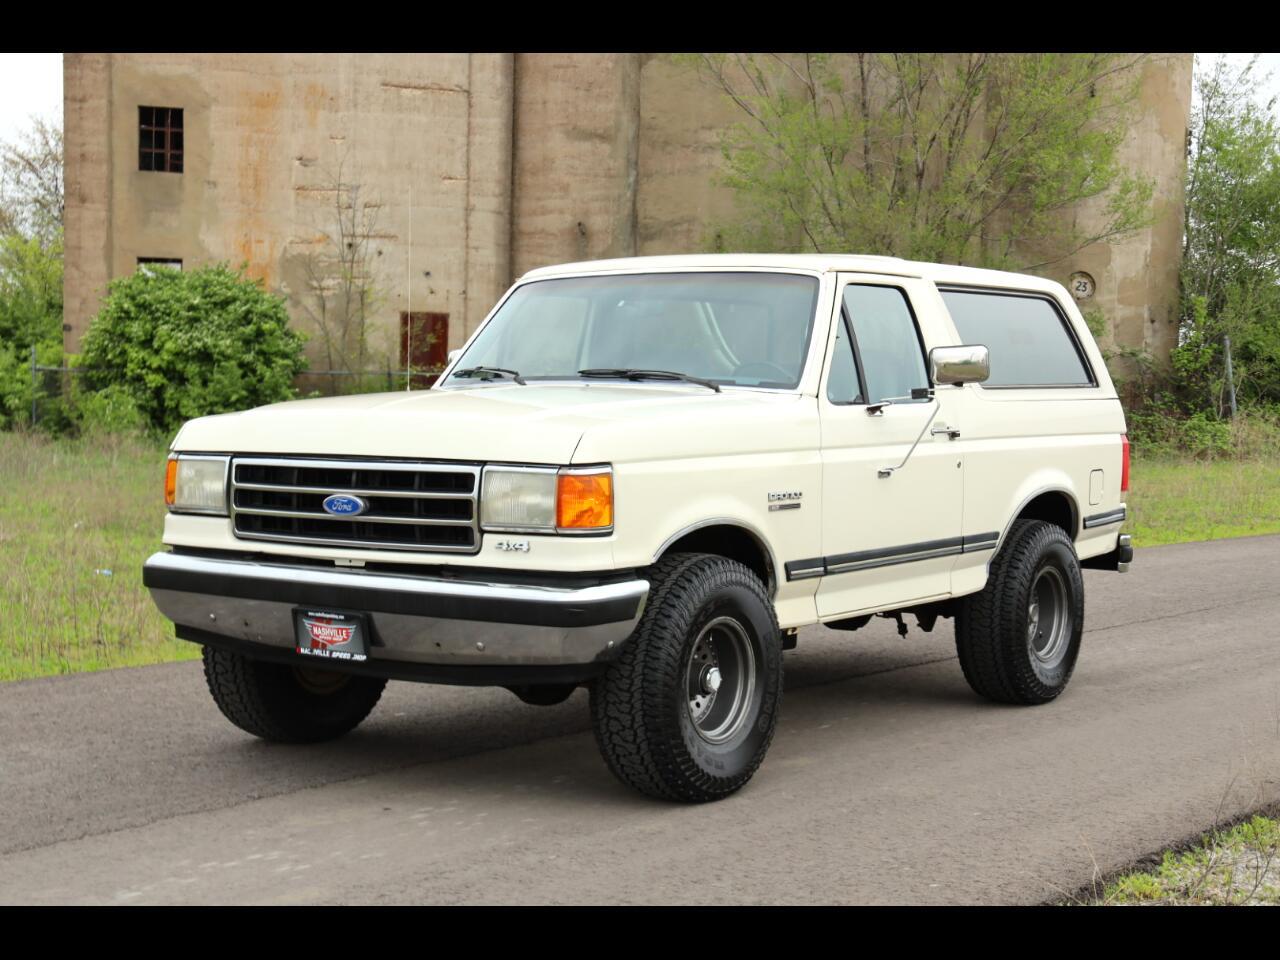 Ford Bronco 2dr Wagon 1990